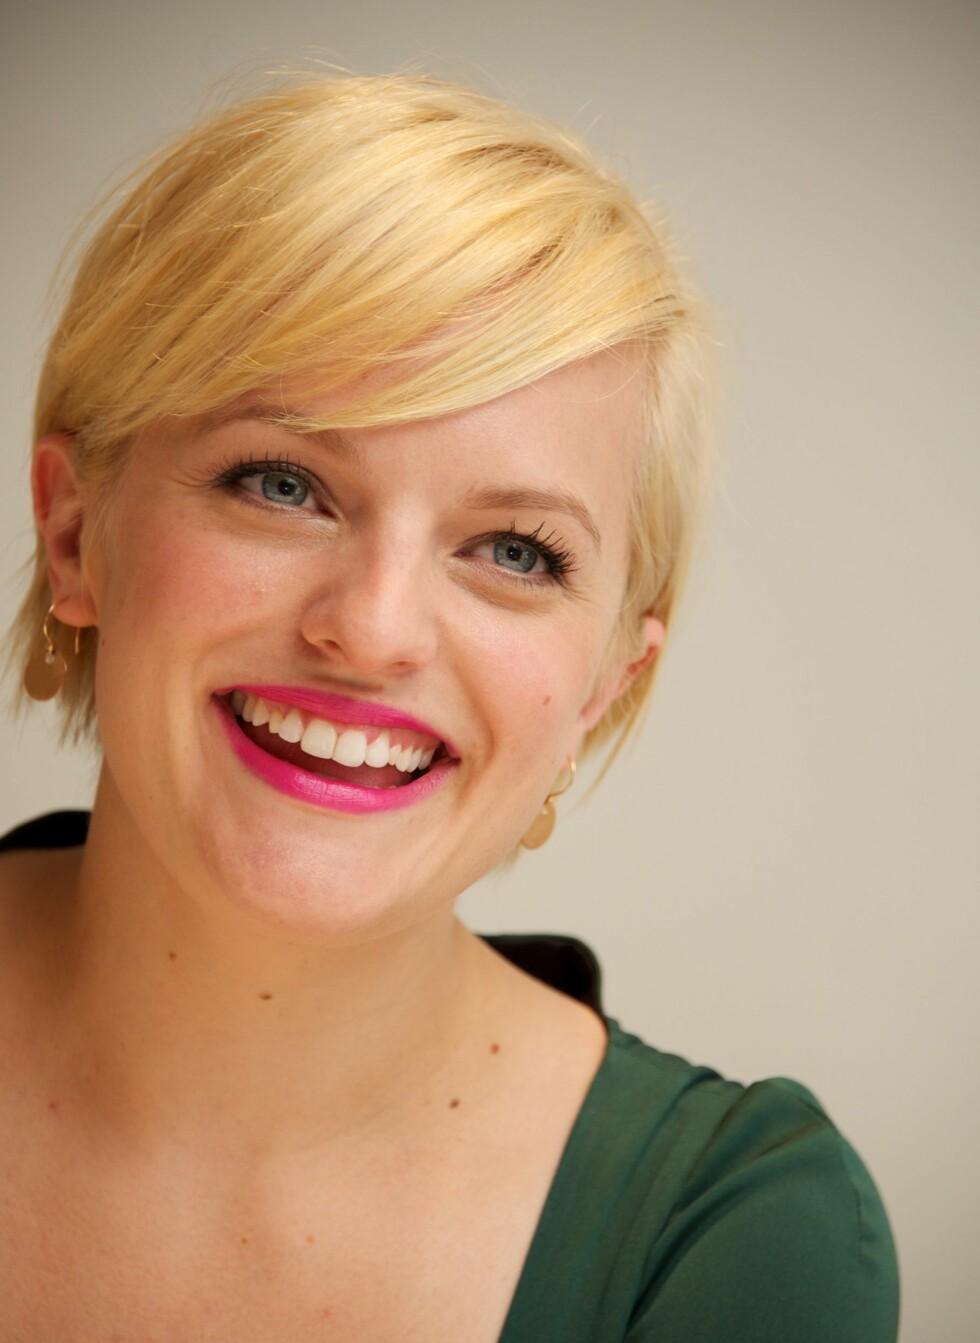 NÅ: Blondt, kort og kledelig. Foto: All Over Press